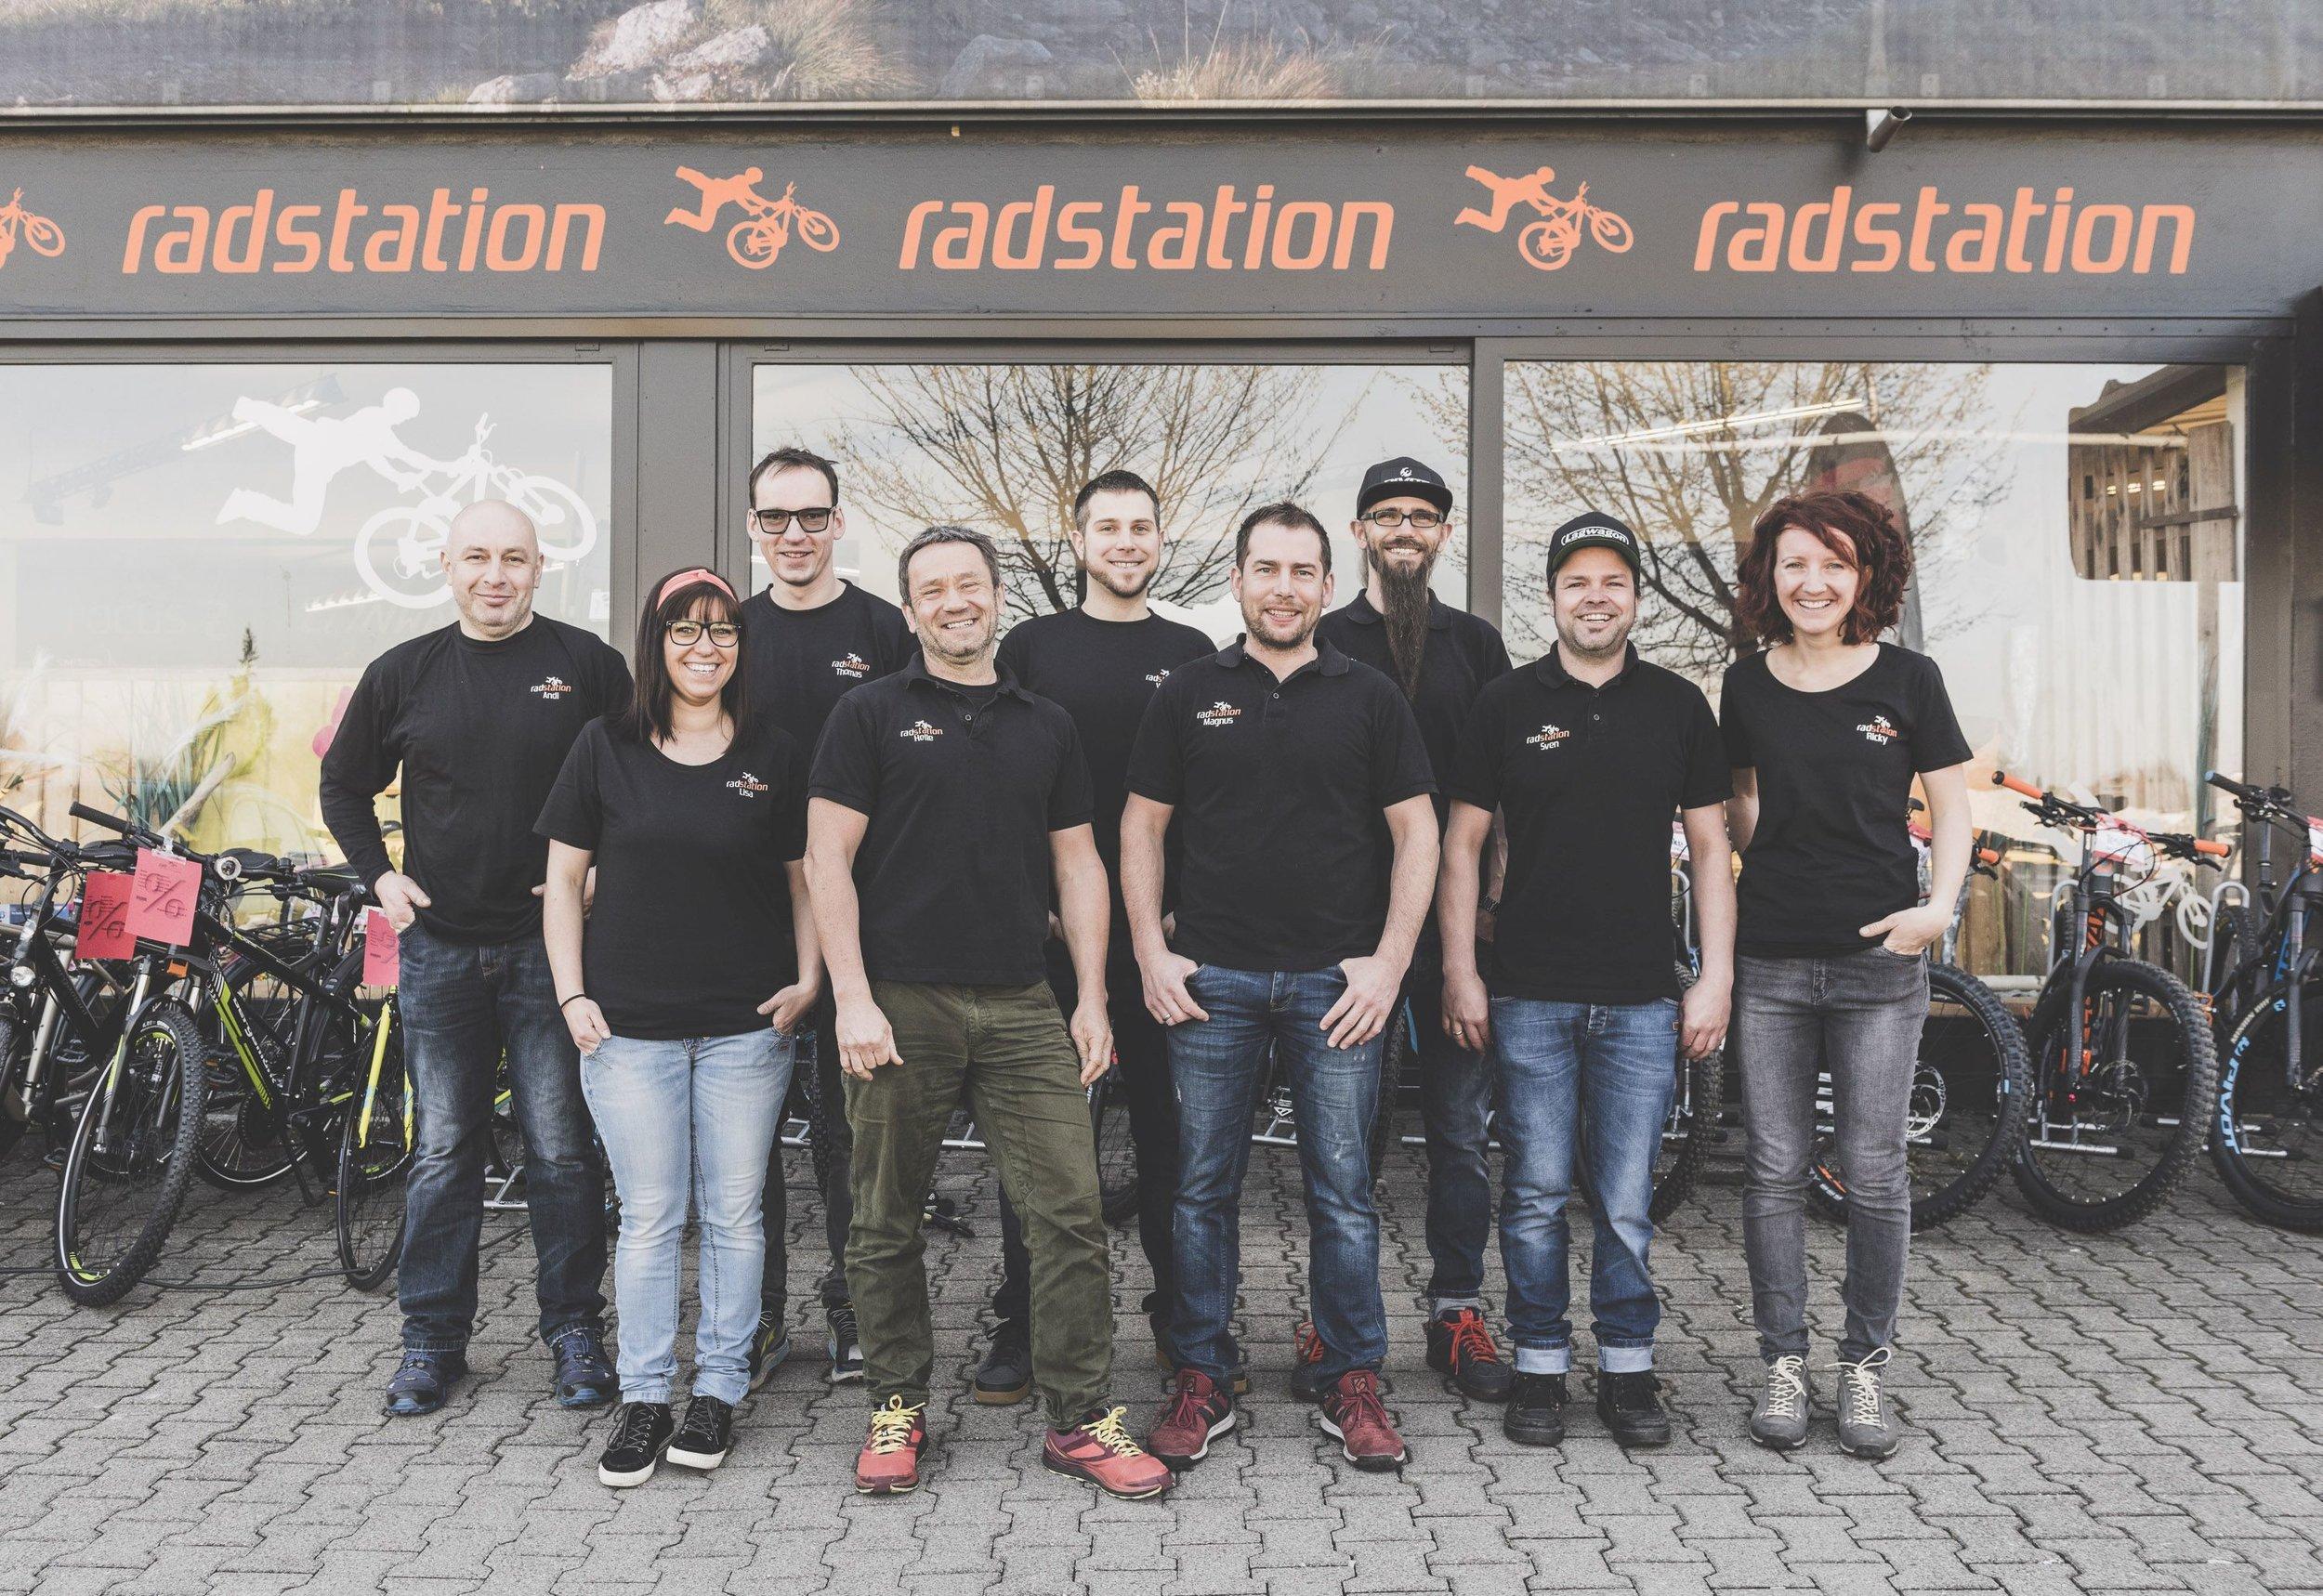 radstation-lindau-team-bikeshop.jpg